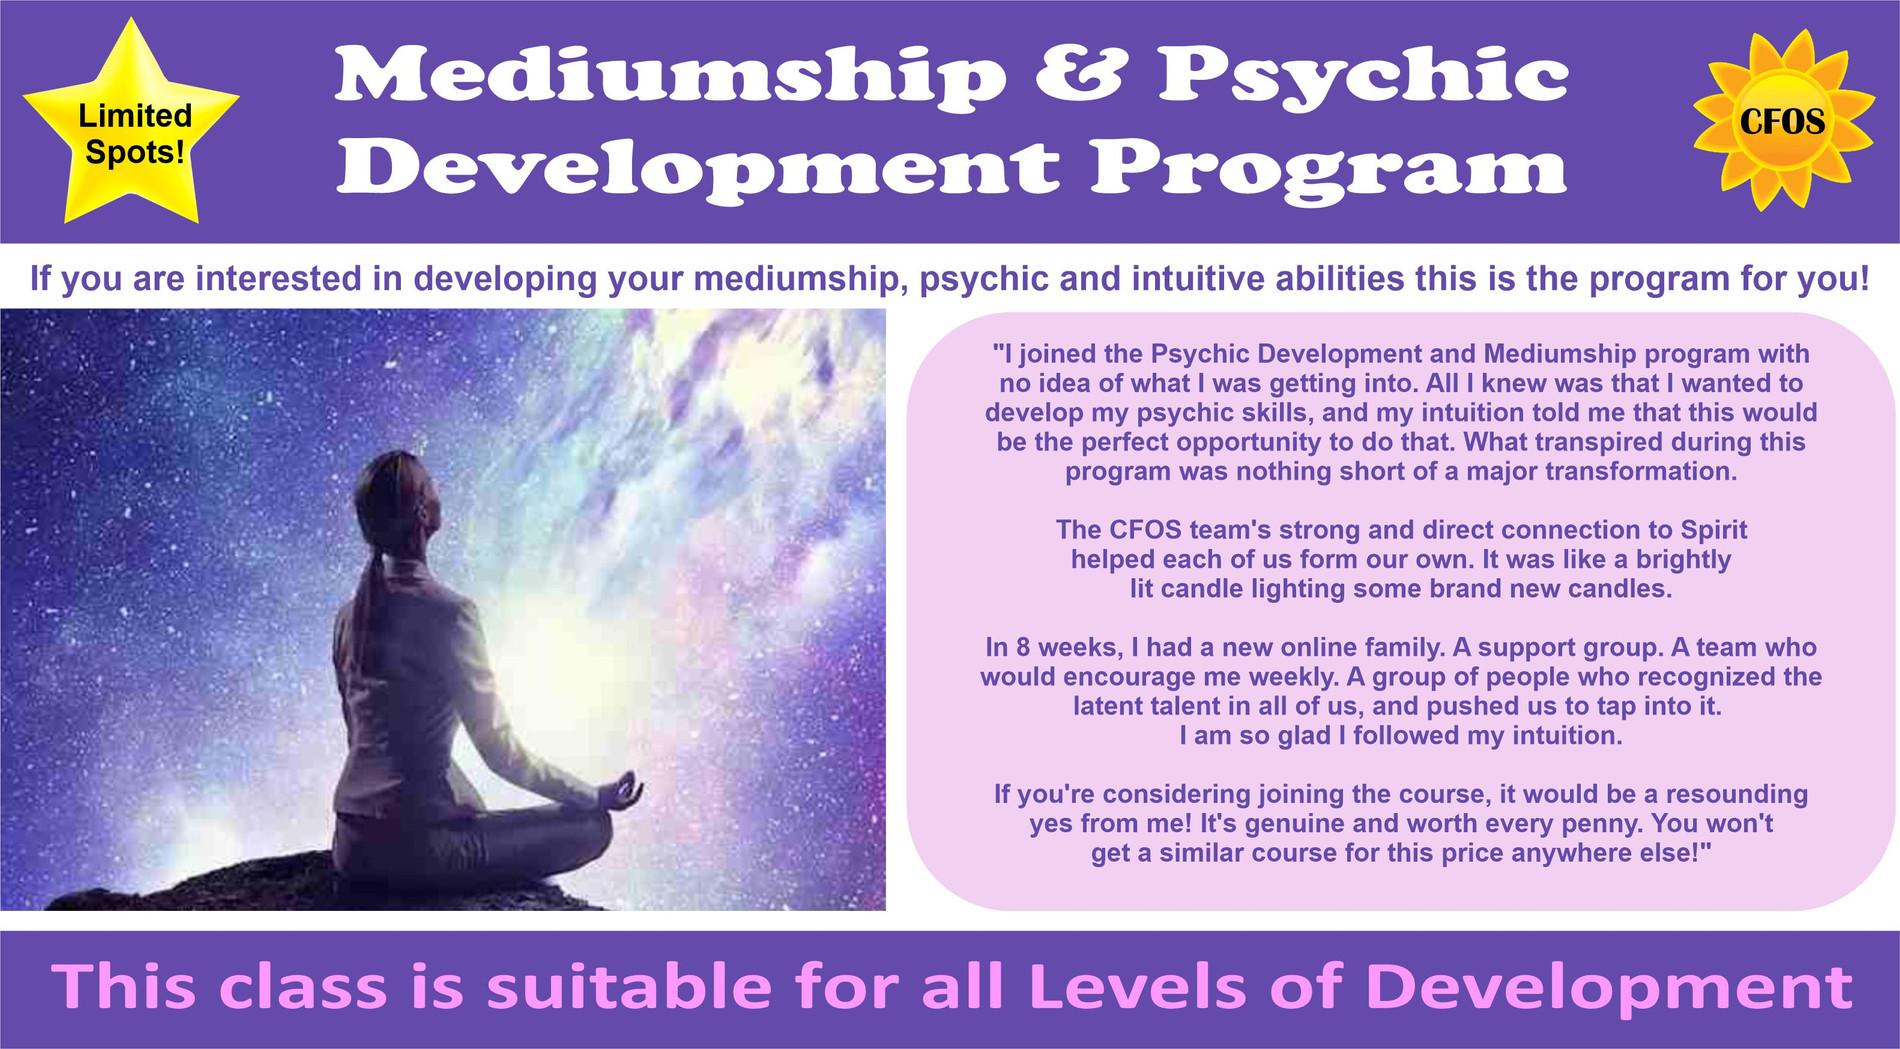 Mediumship & Psychic Development Program 8-Weeks